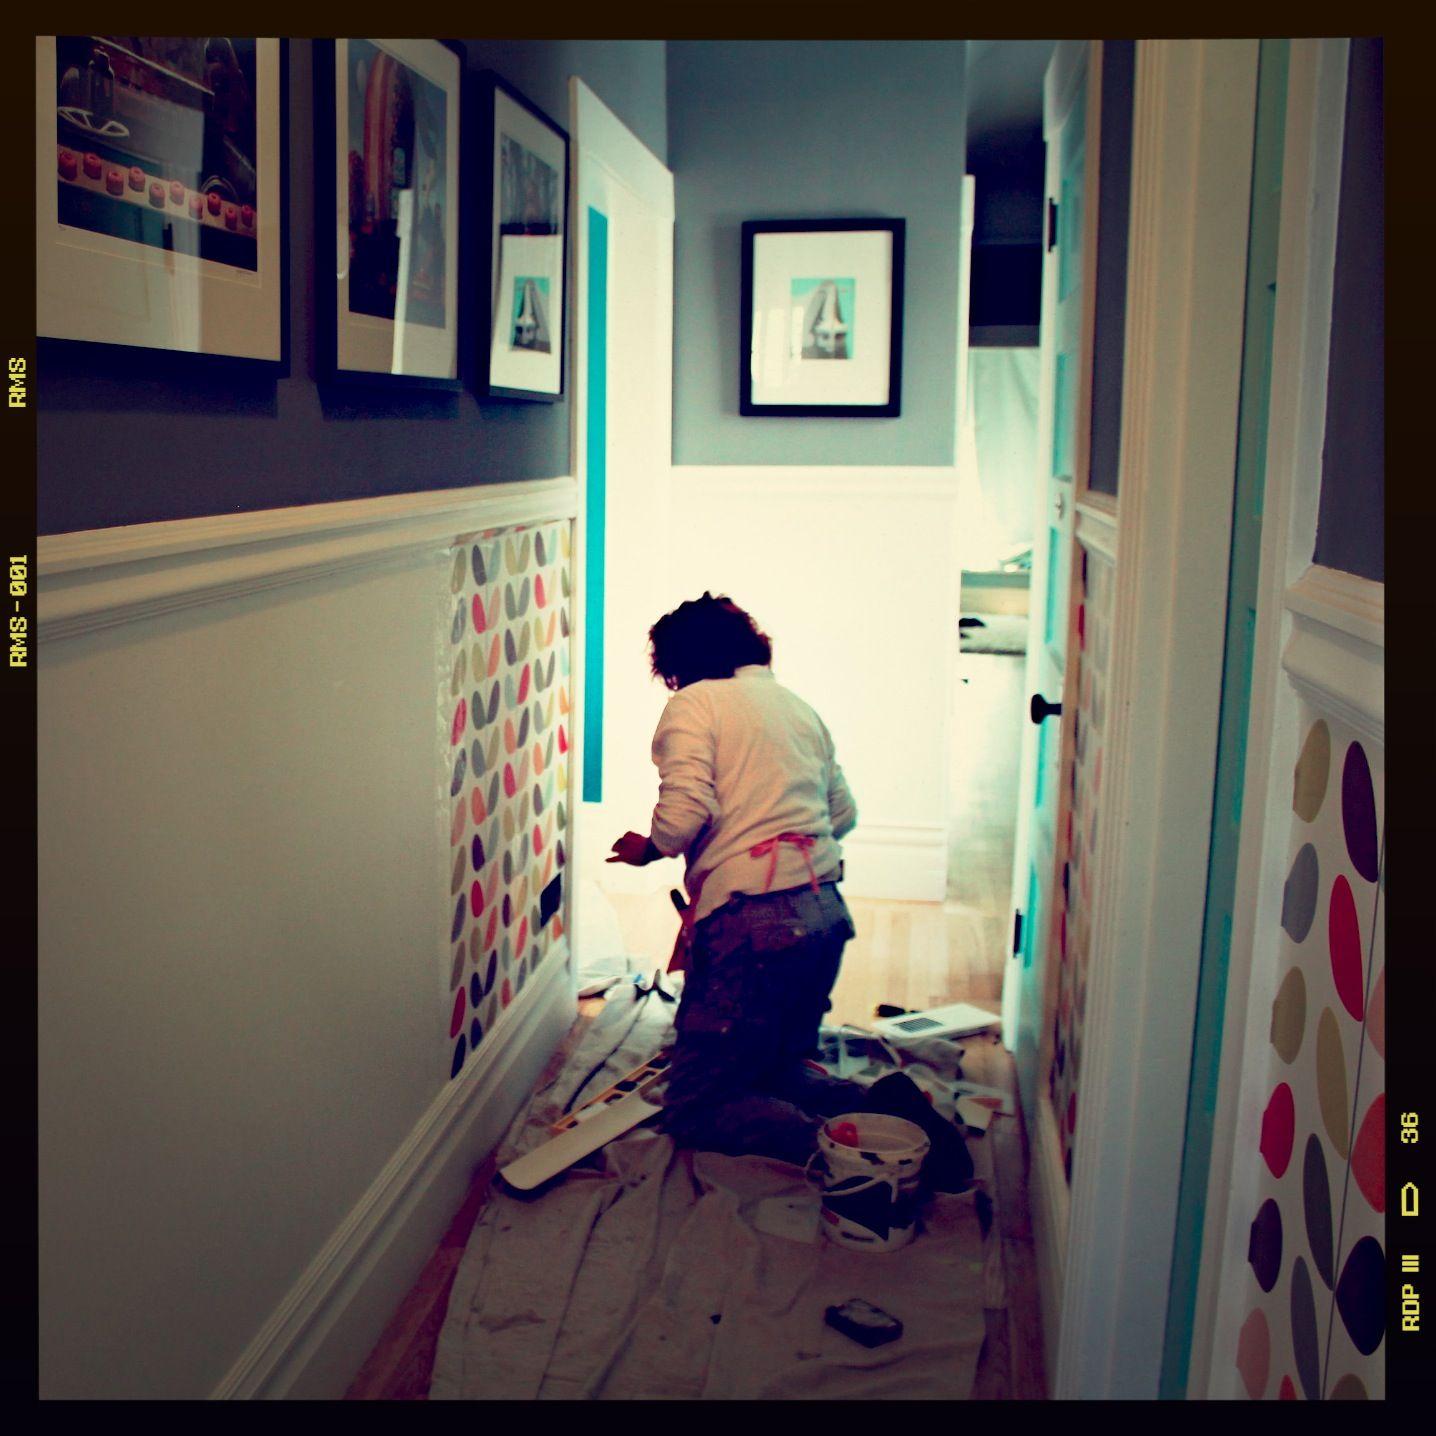 New Home Design Ideas Theme Inspiration 10 Hallway: I Like The Dado Rail To Divide The Hallway Walls. Paint